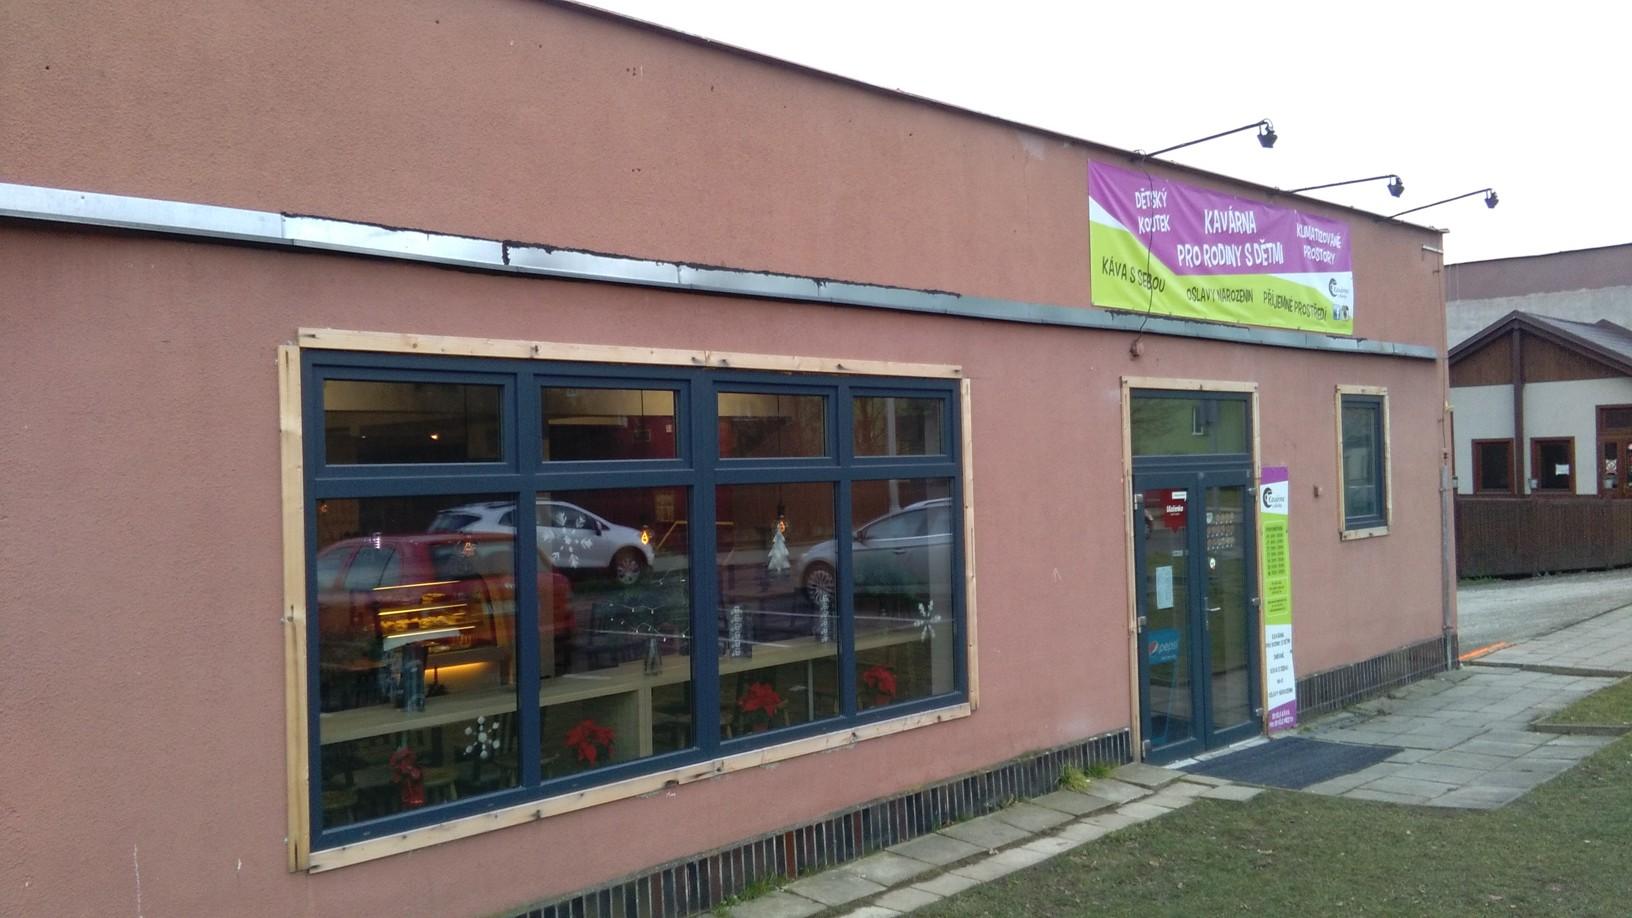 Pobočka Frýdek-Místek, Slezská 3150 (Kavárna u školky)